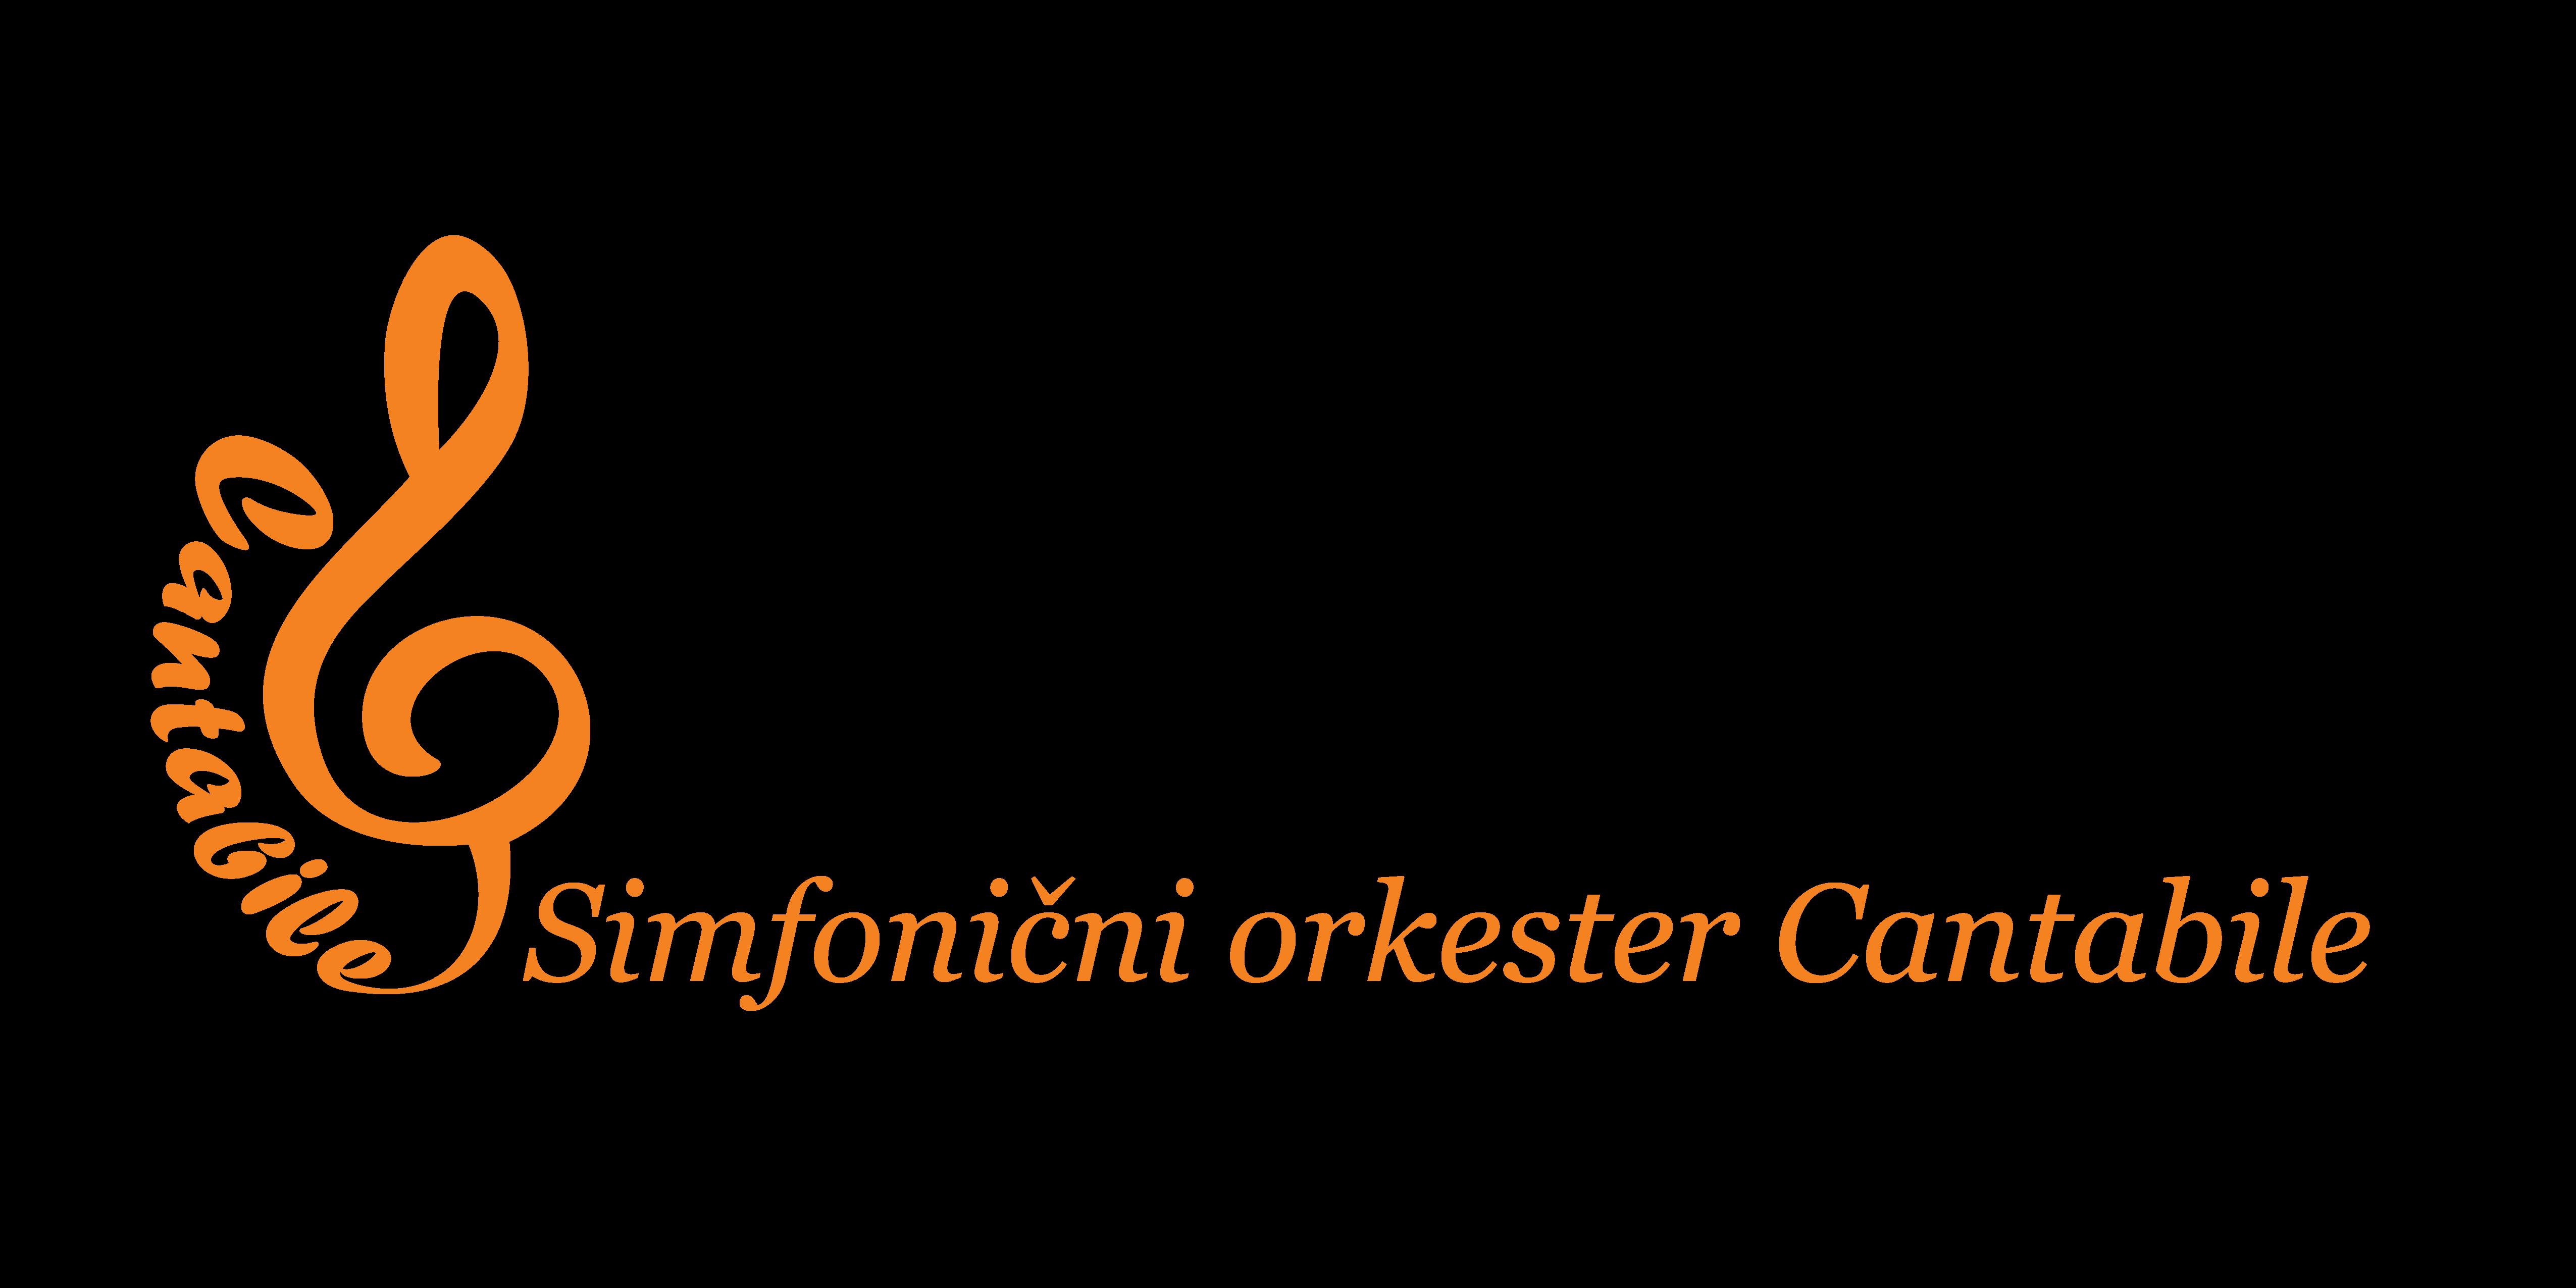 Clani orkestra